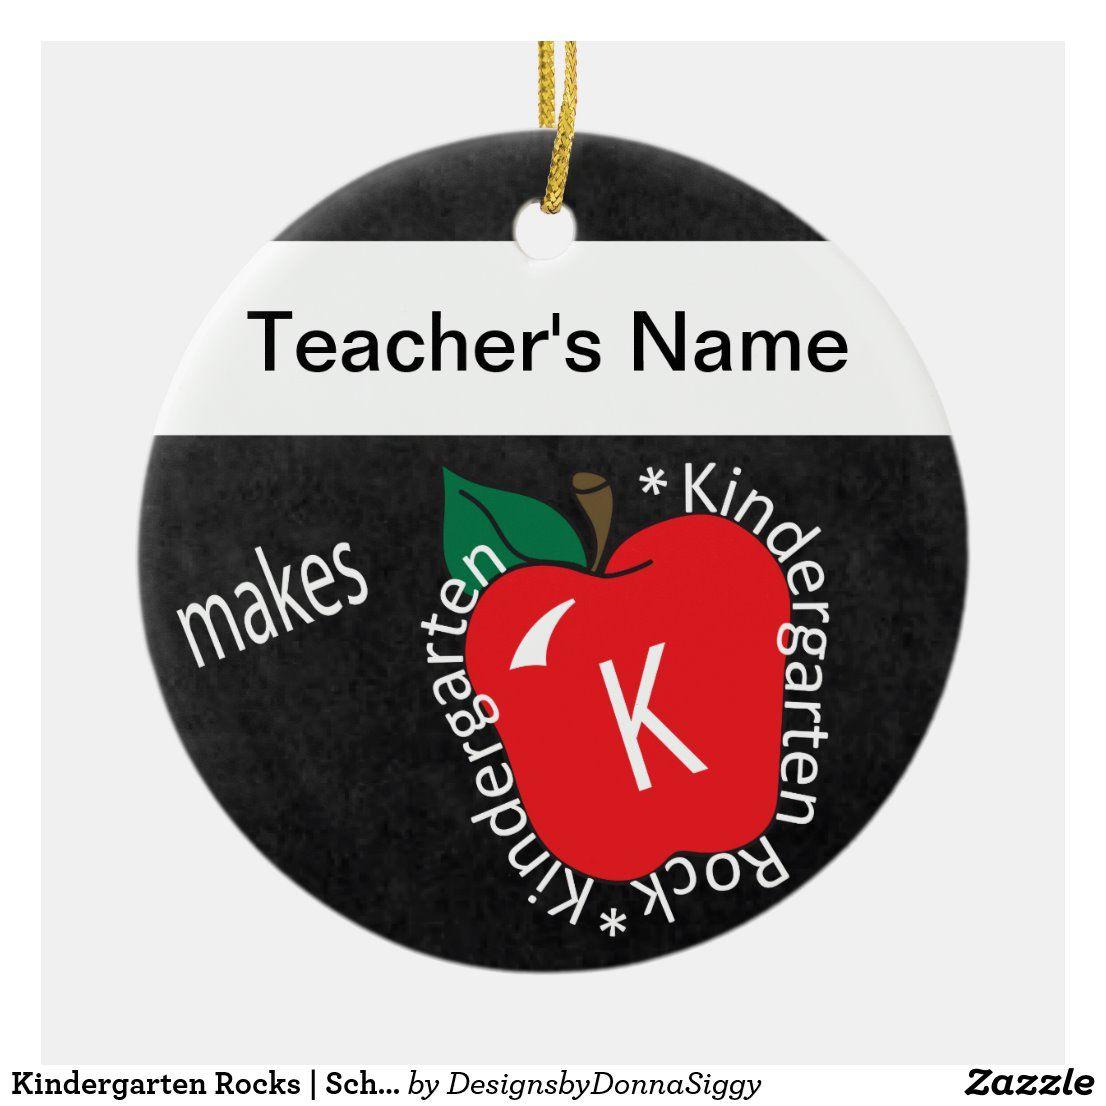 Kindergarten Rocks | School Teacher | Chalkboard Ceramic Ornament | Zazzle.com